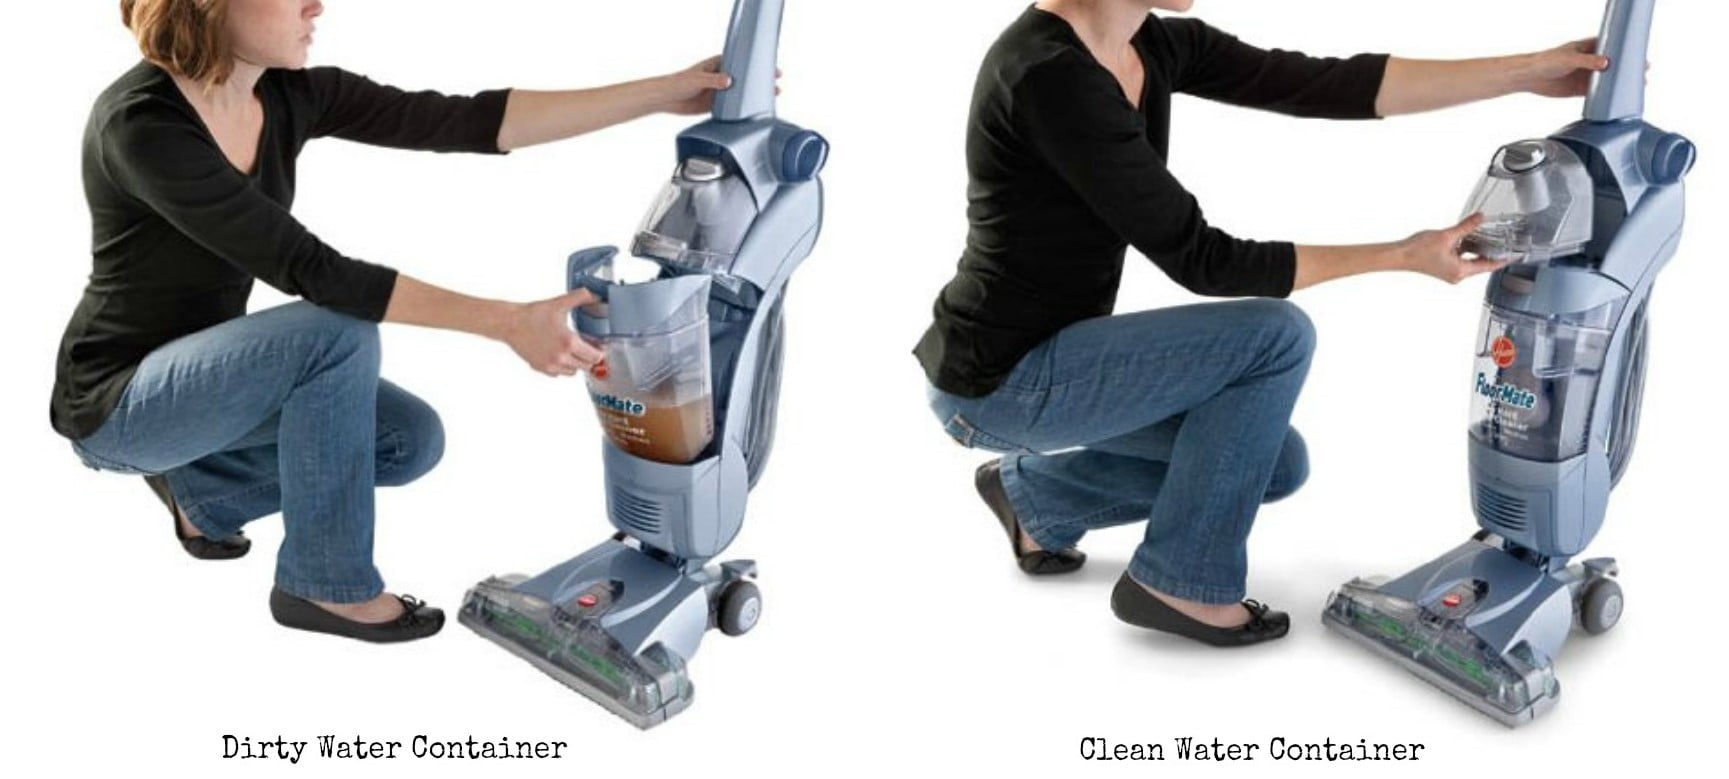 Hoover FloorMate SpinScrub Vacuum